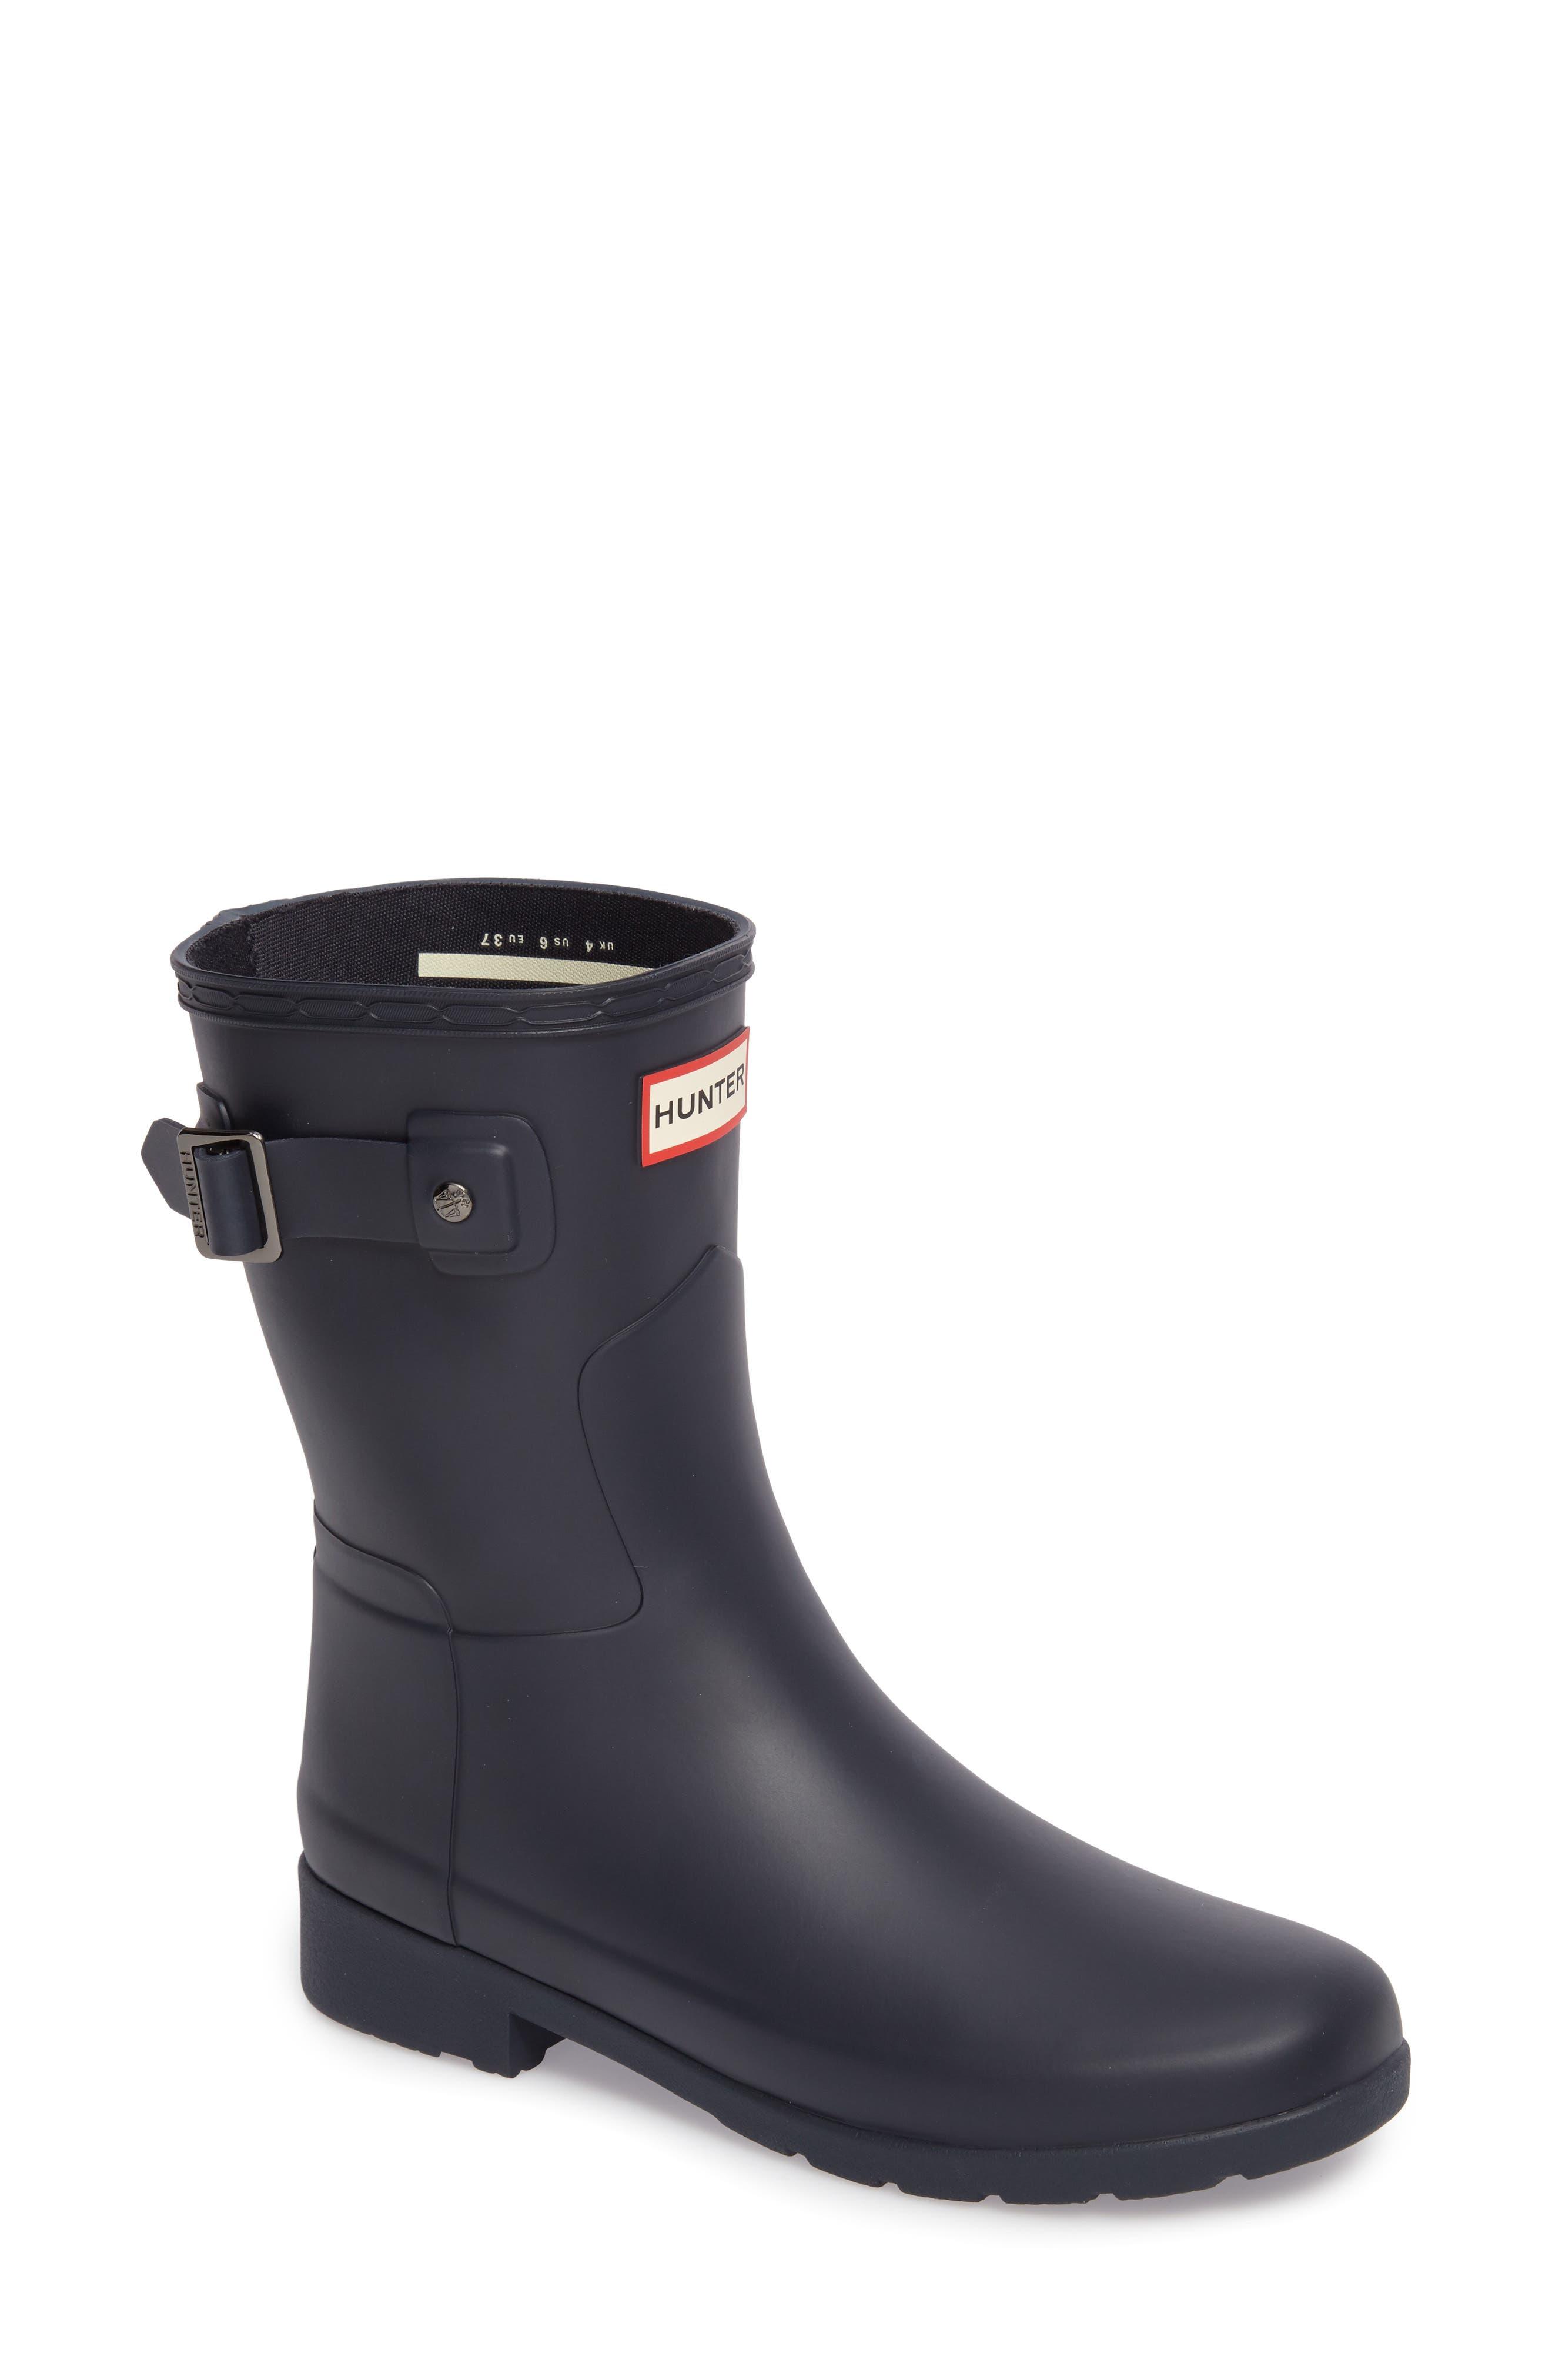 HUNTER Original Refined Short Waterproof Rain Boot, Main, color, NAVY